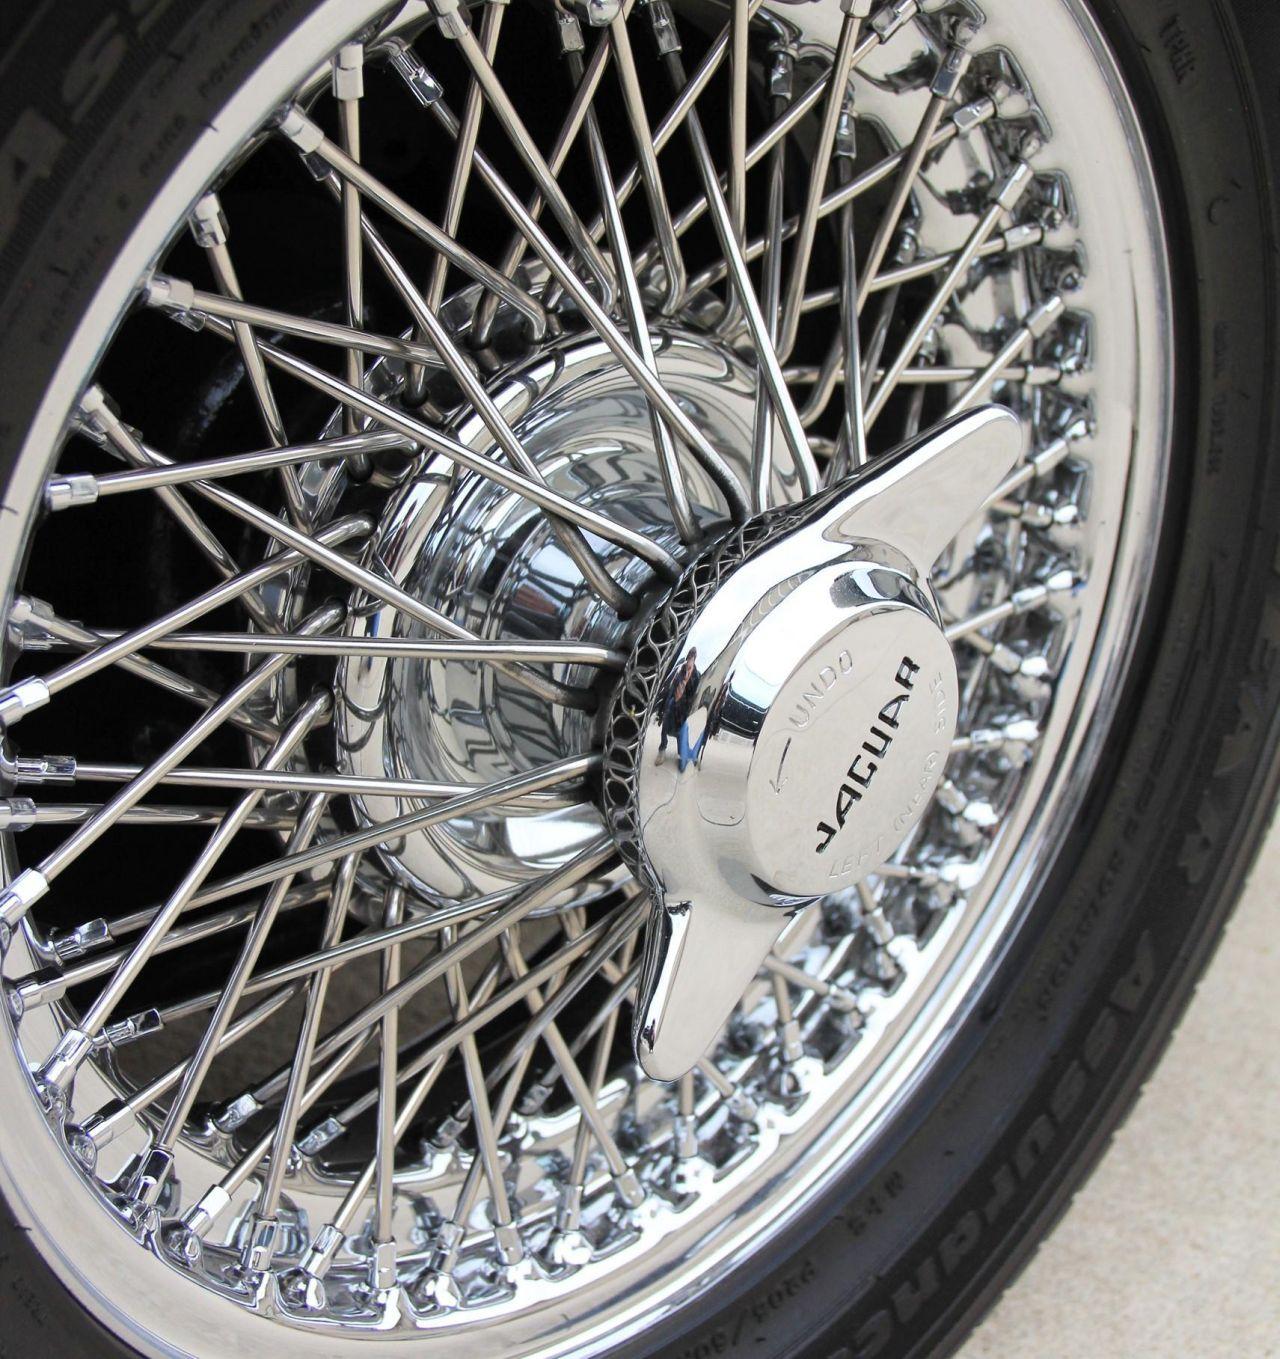 '64 Jaguar Type E... V8 ! - My name is Donald, Mac Donald 24